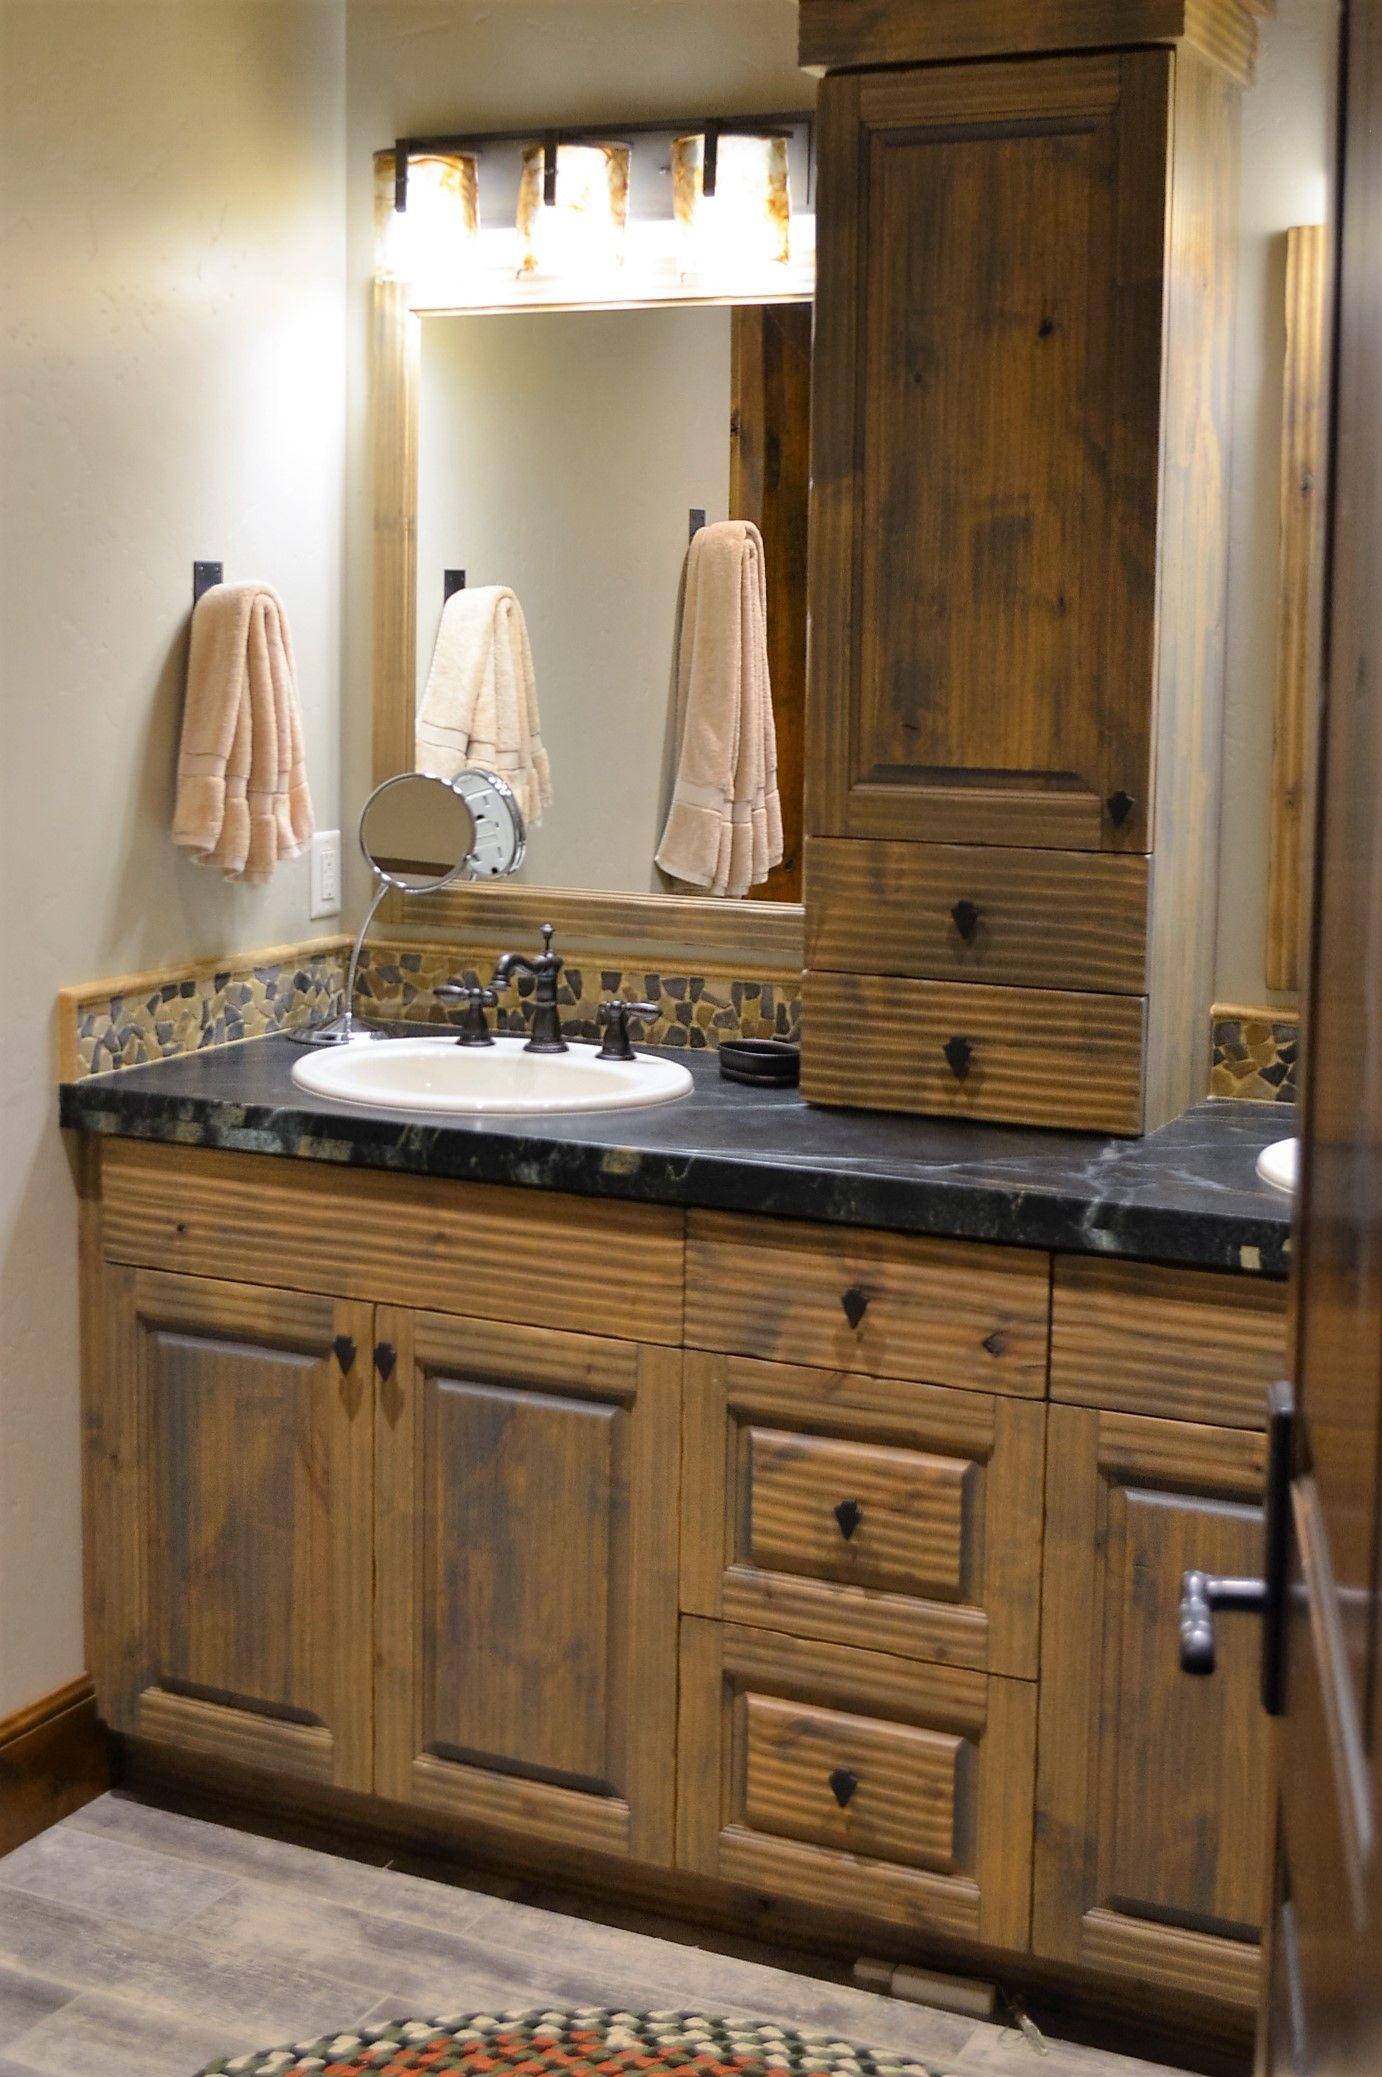 Grey Granite Countertop River Rock Backsplash Guest Bathroom